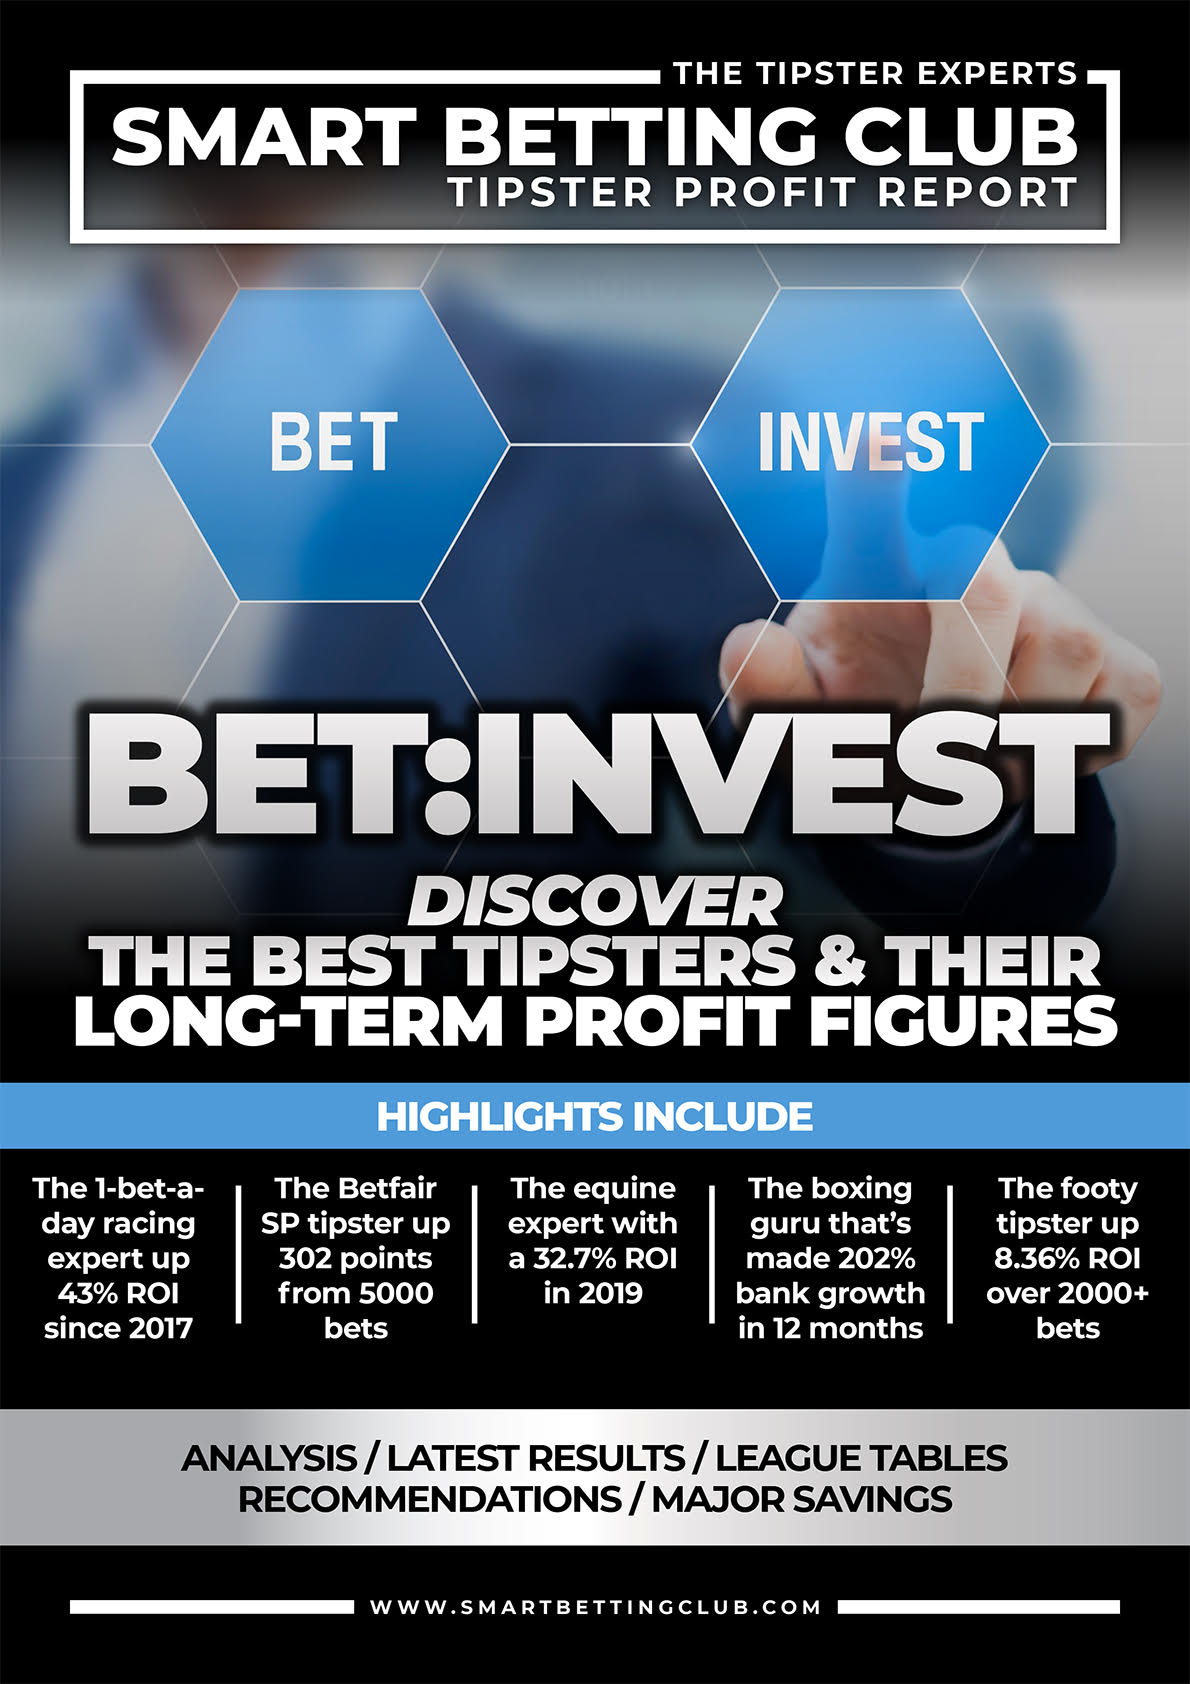 Smart betting tip cis bettingadvice